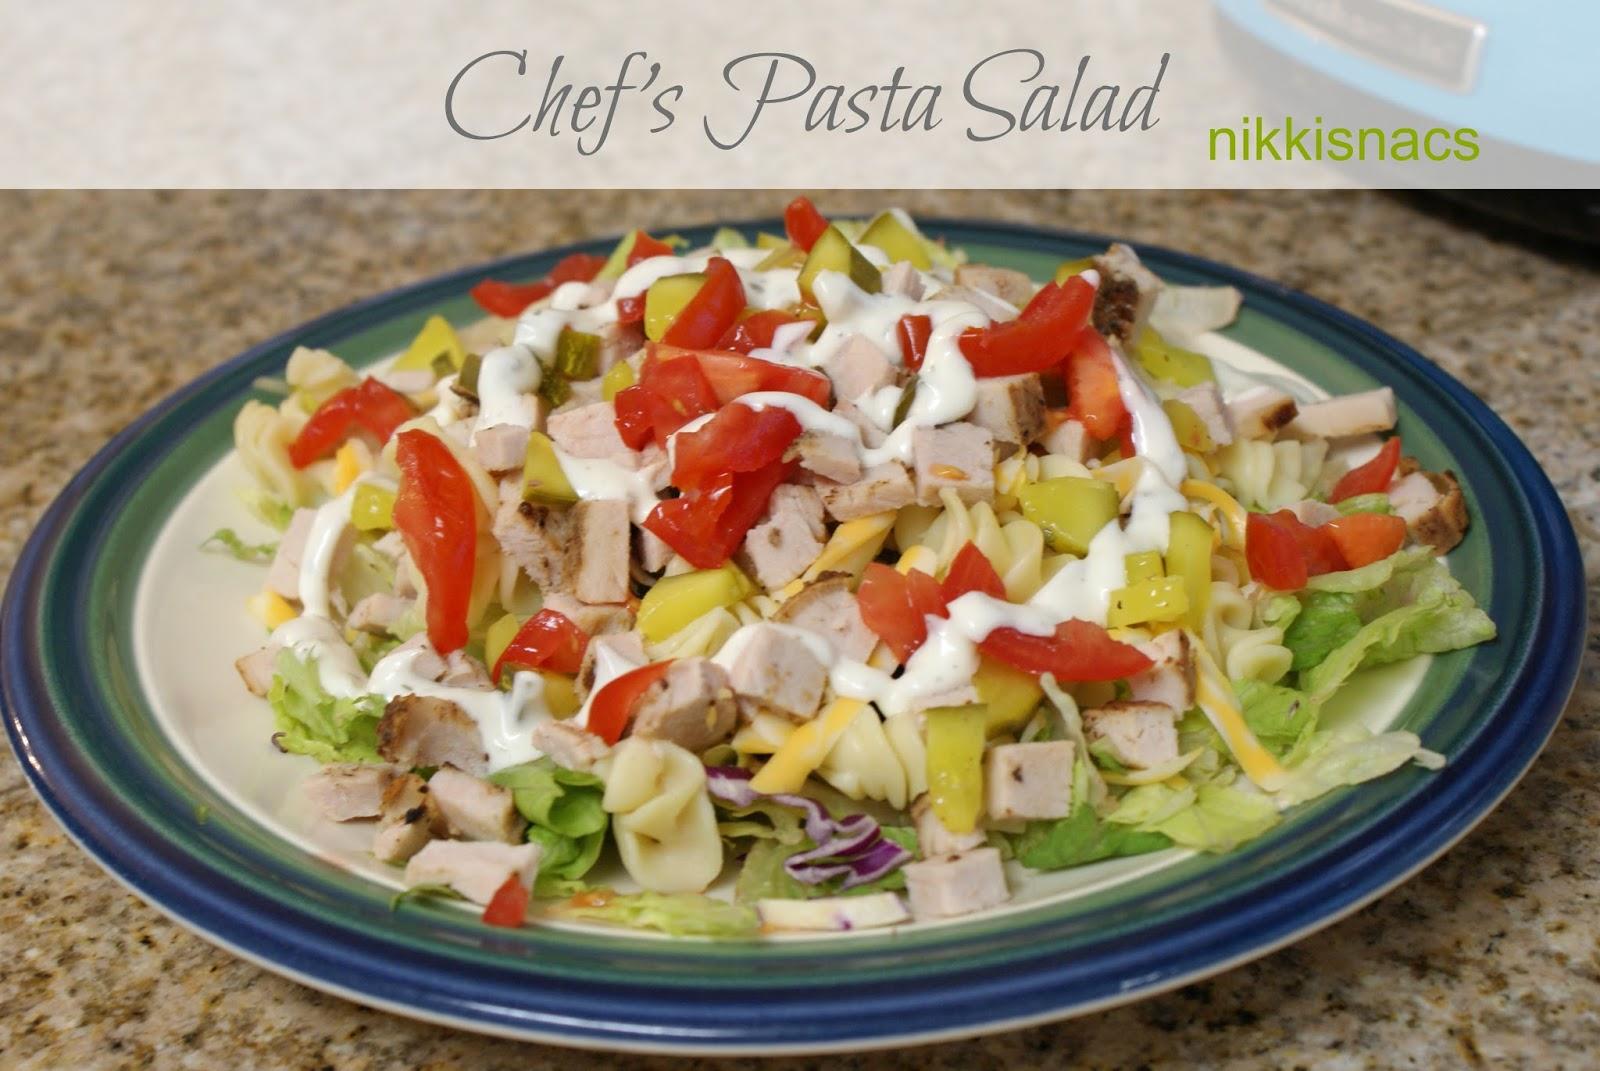 Nikkis' Nacs: Chef's Pasta Salad